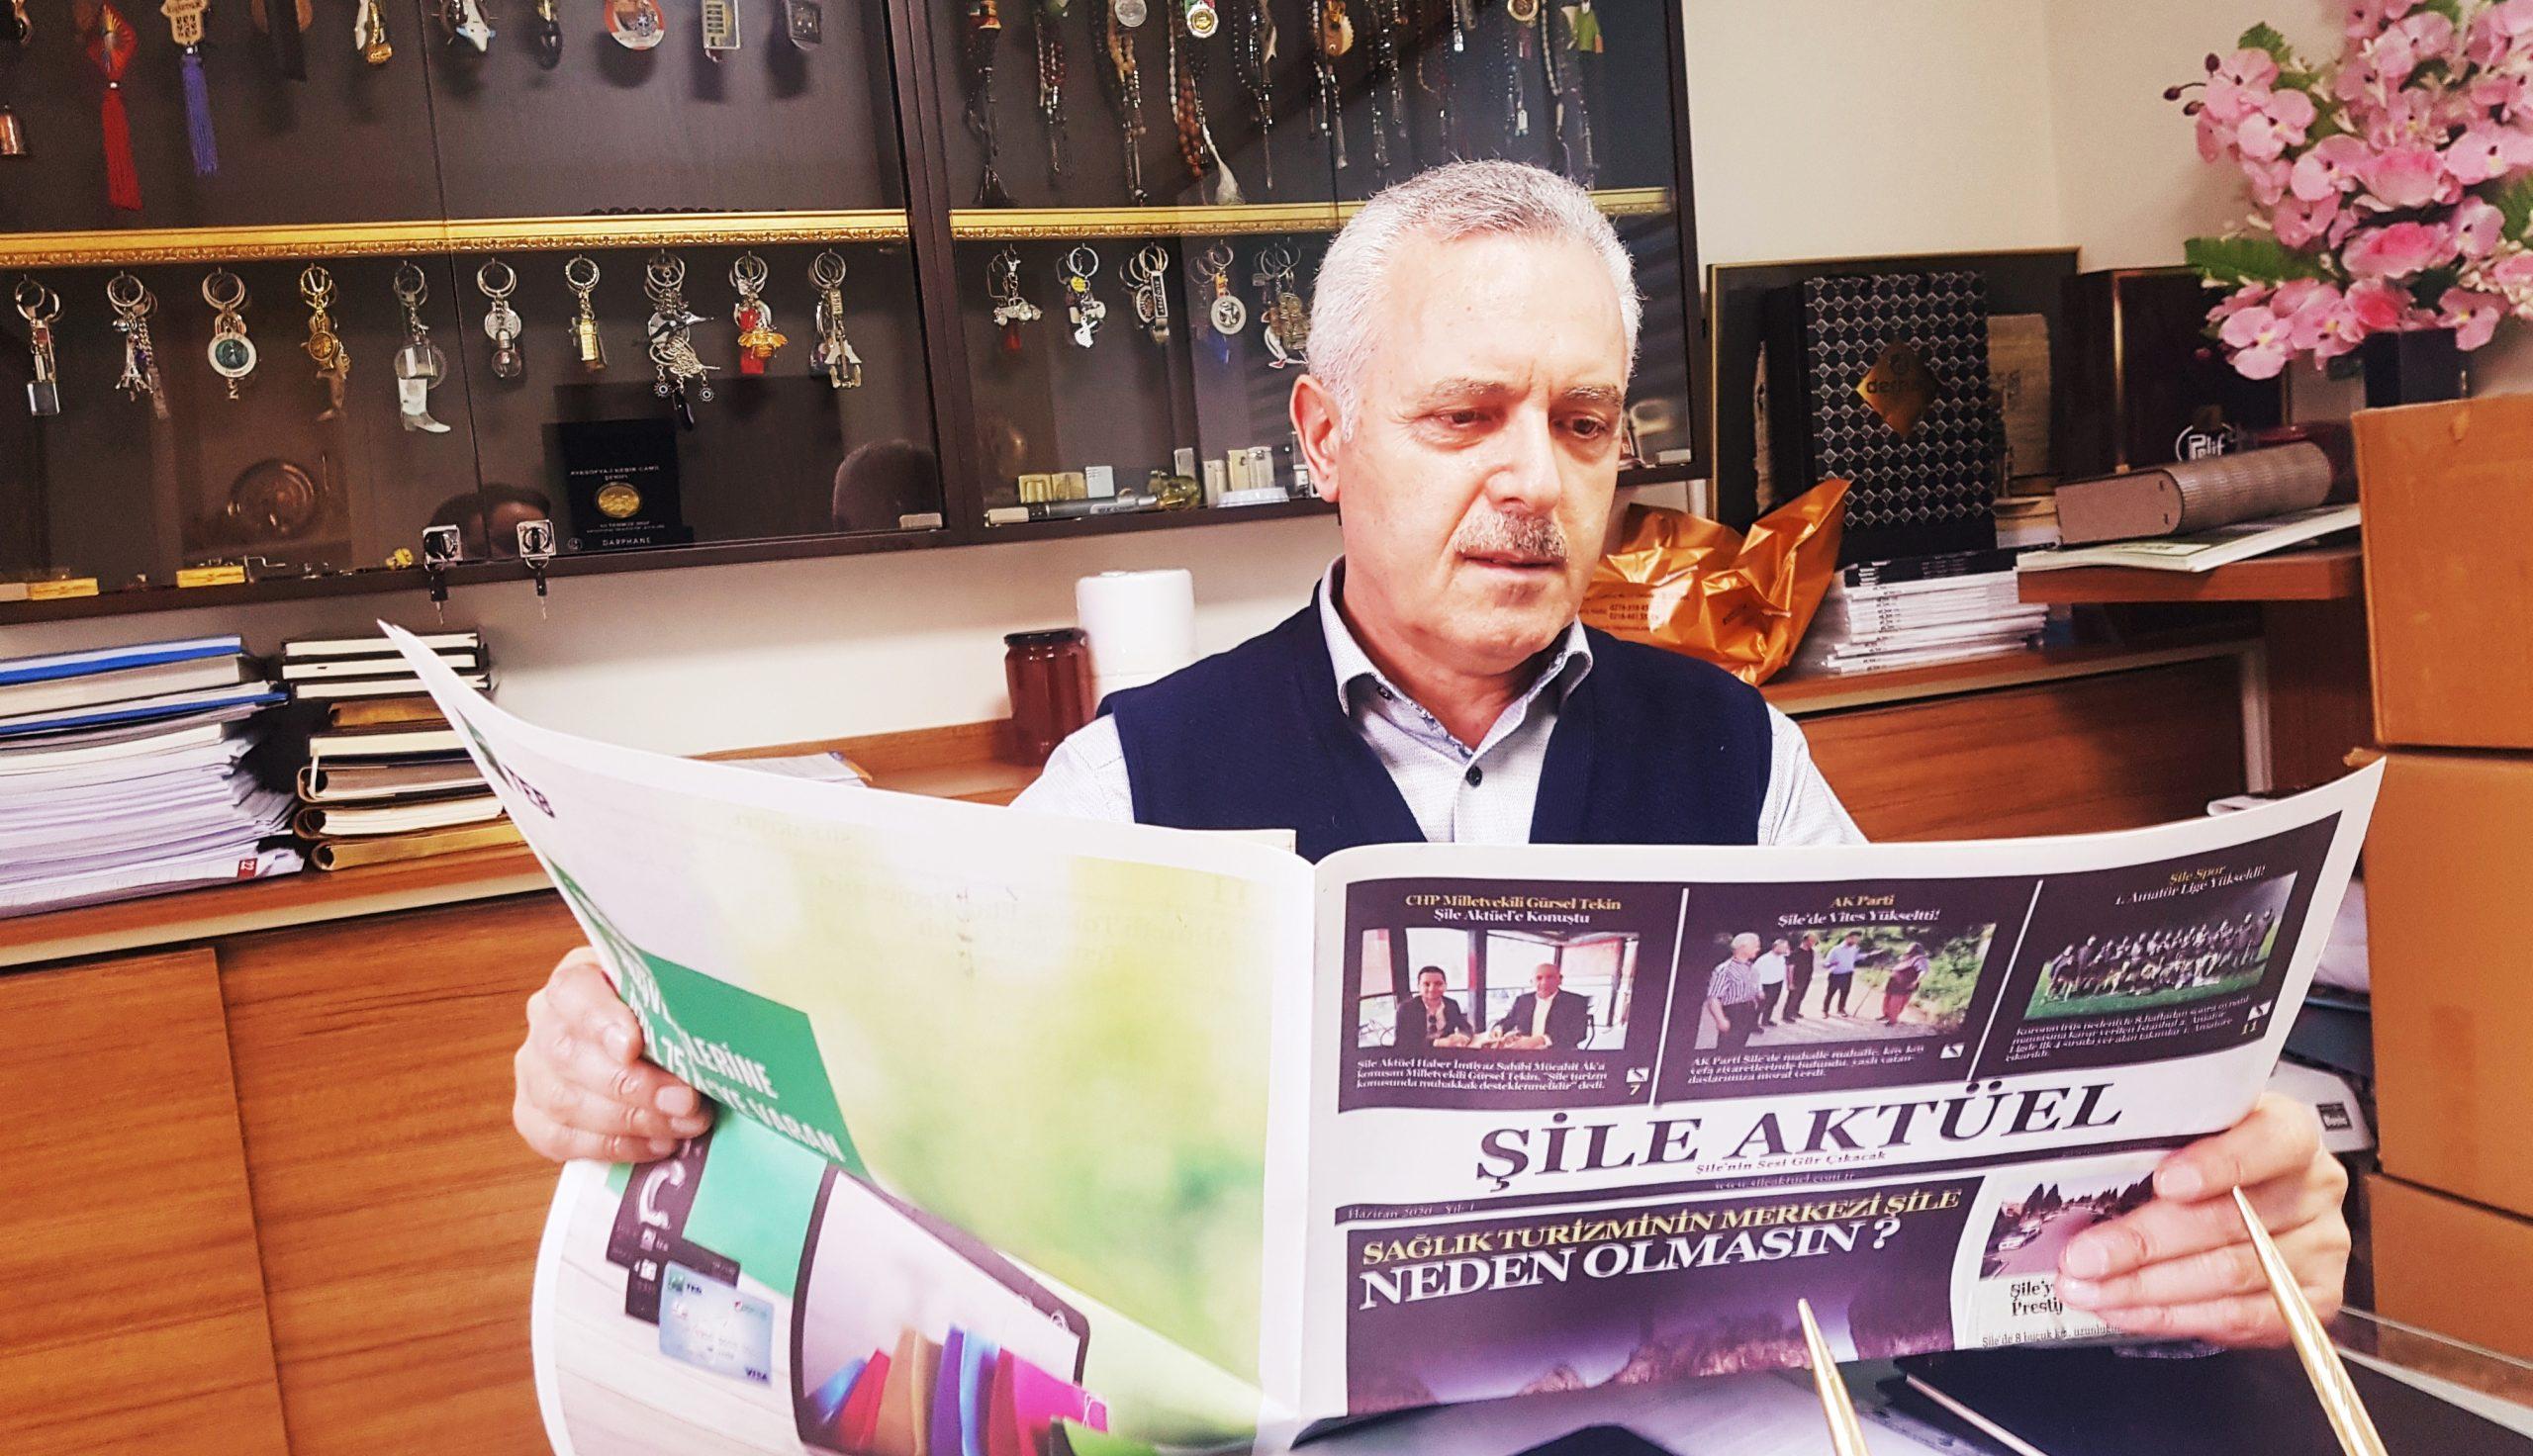 AK Parti İstanbul Milletvekili Mustafa Ataş: Şile bambaşka olacak!